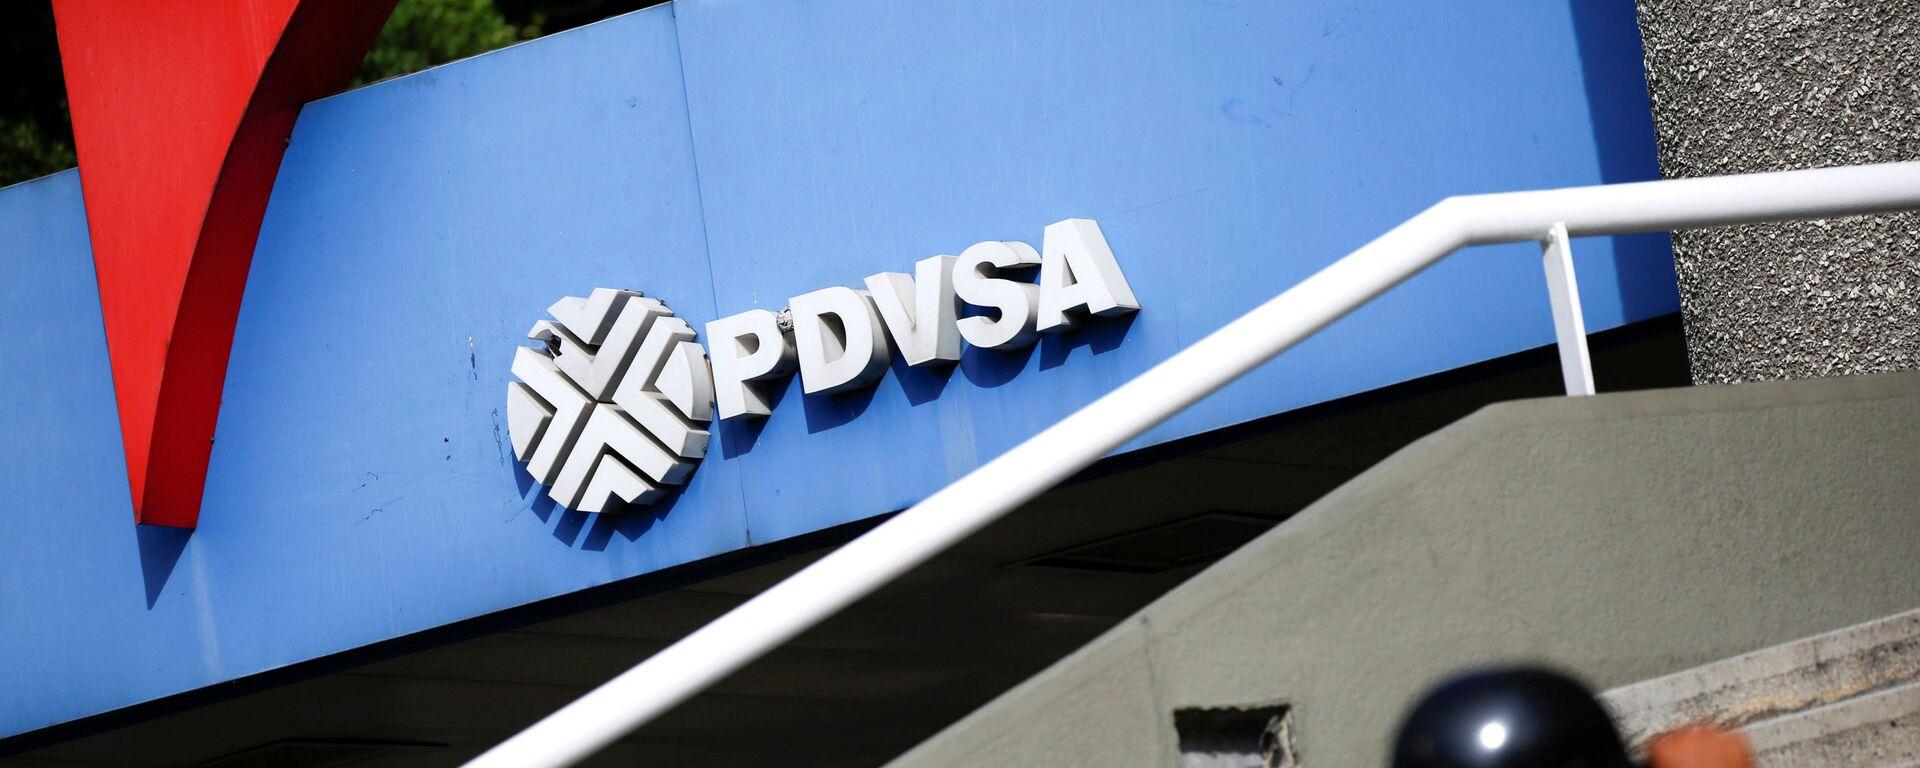 A man walks past a gas station with the logo of the Venezuelan state oil company PDVSA in Caracas, Venezuela December 23, 2016. REUTERS/Carlos Garcia Rawlins - Sputnik Mundo, 1920, 22.04.2021